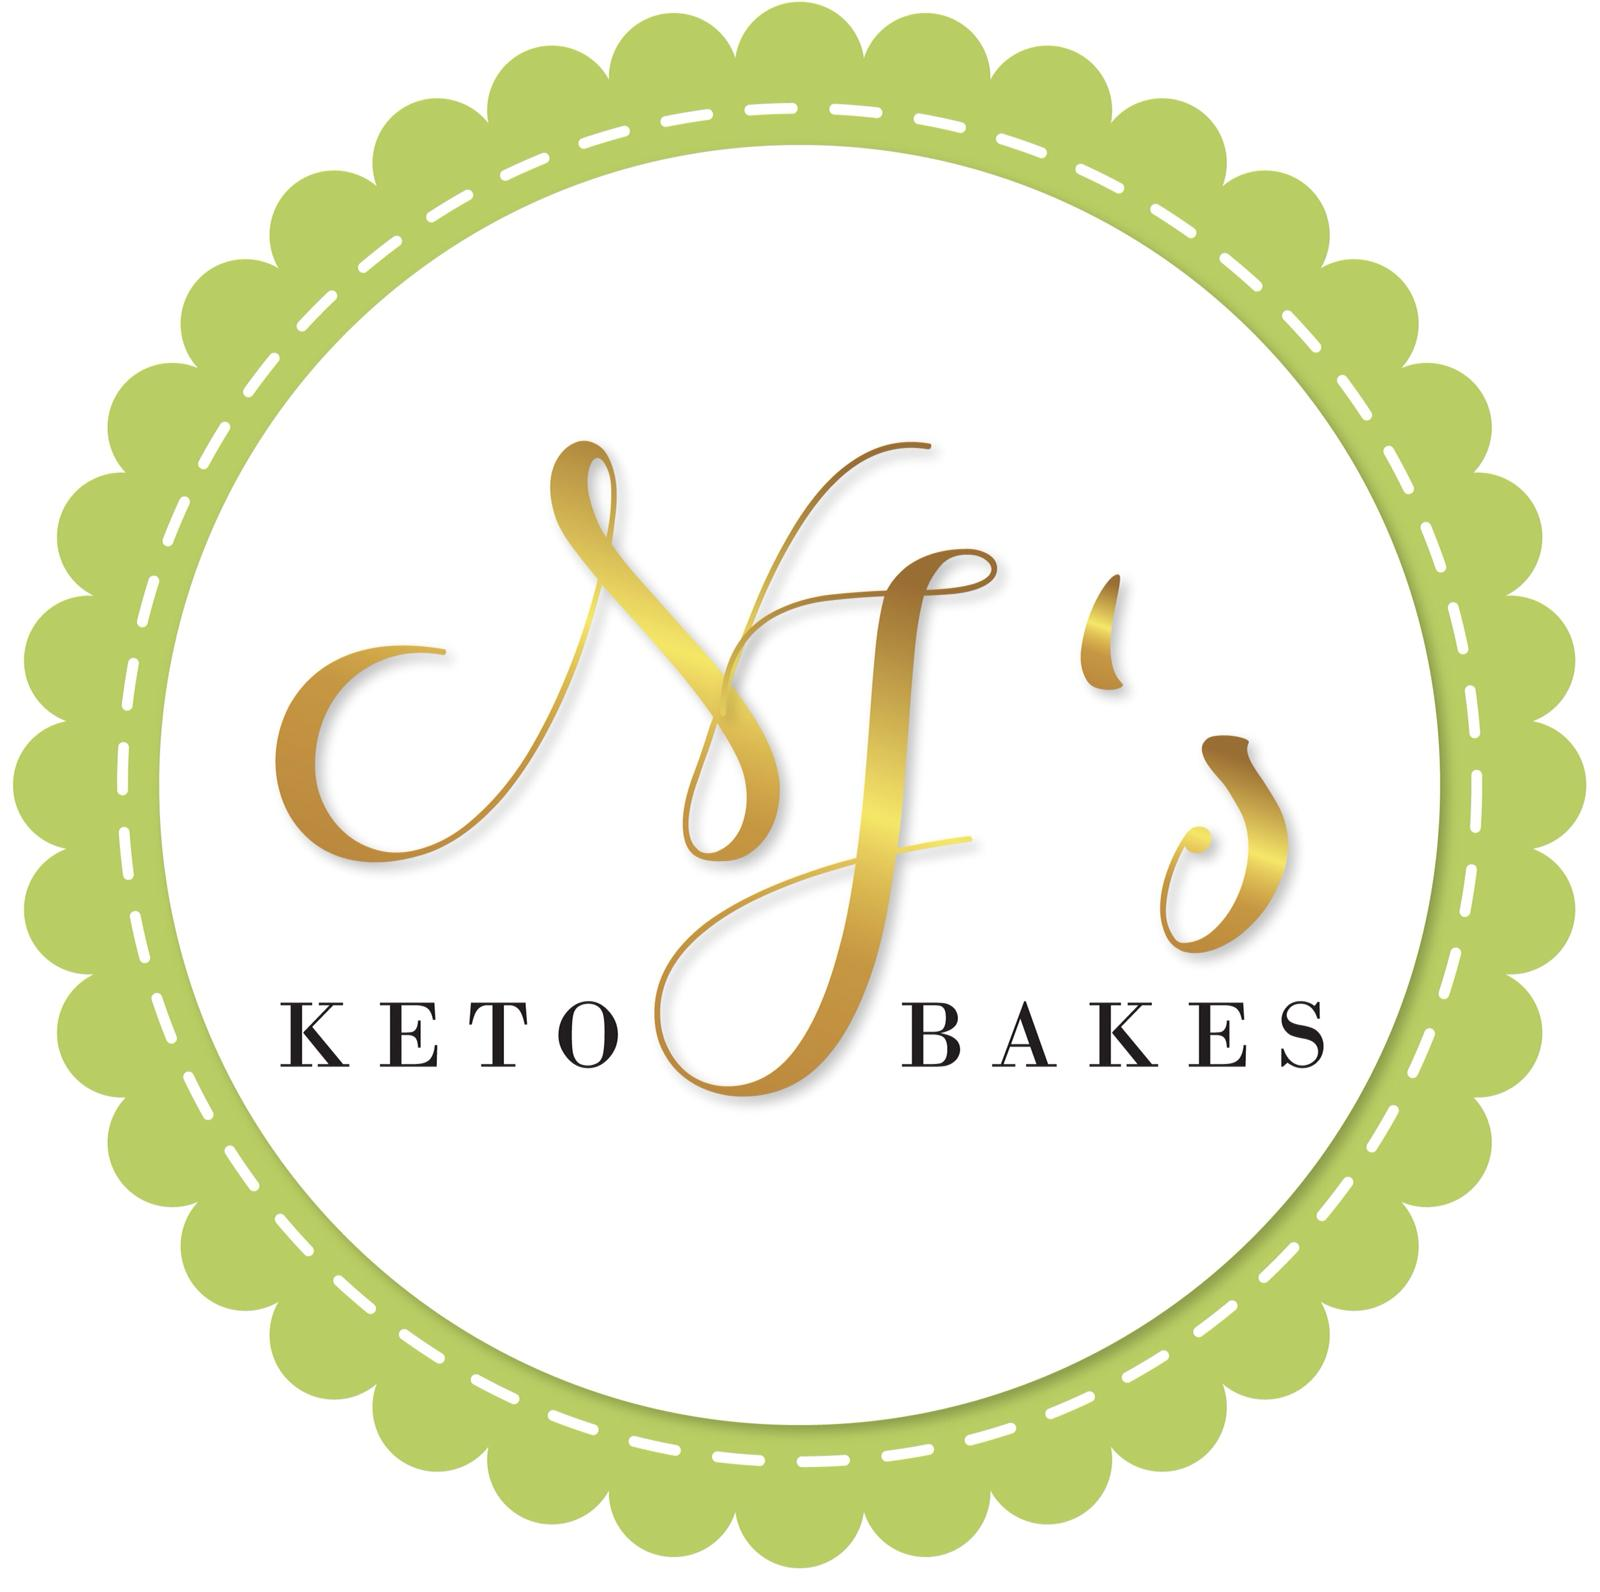 NJ's Keto Bakes